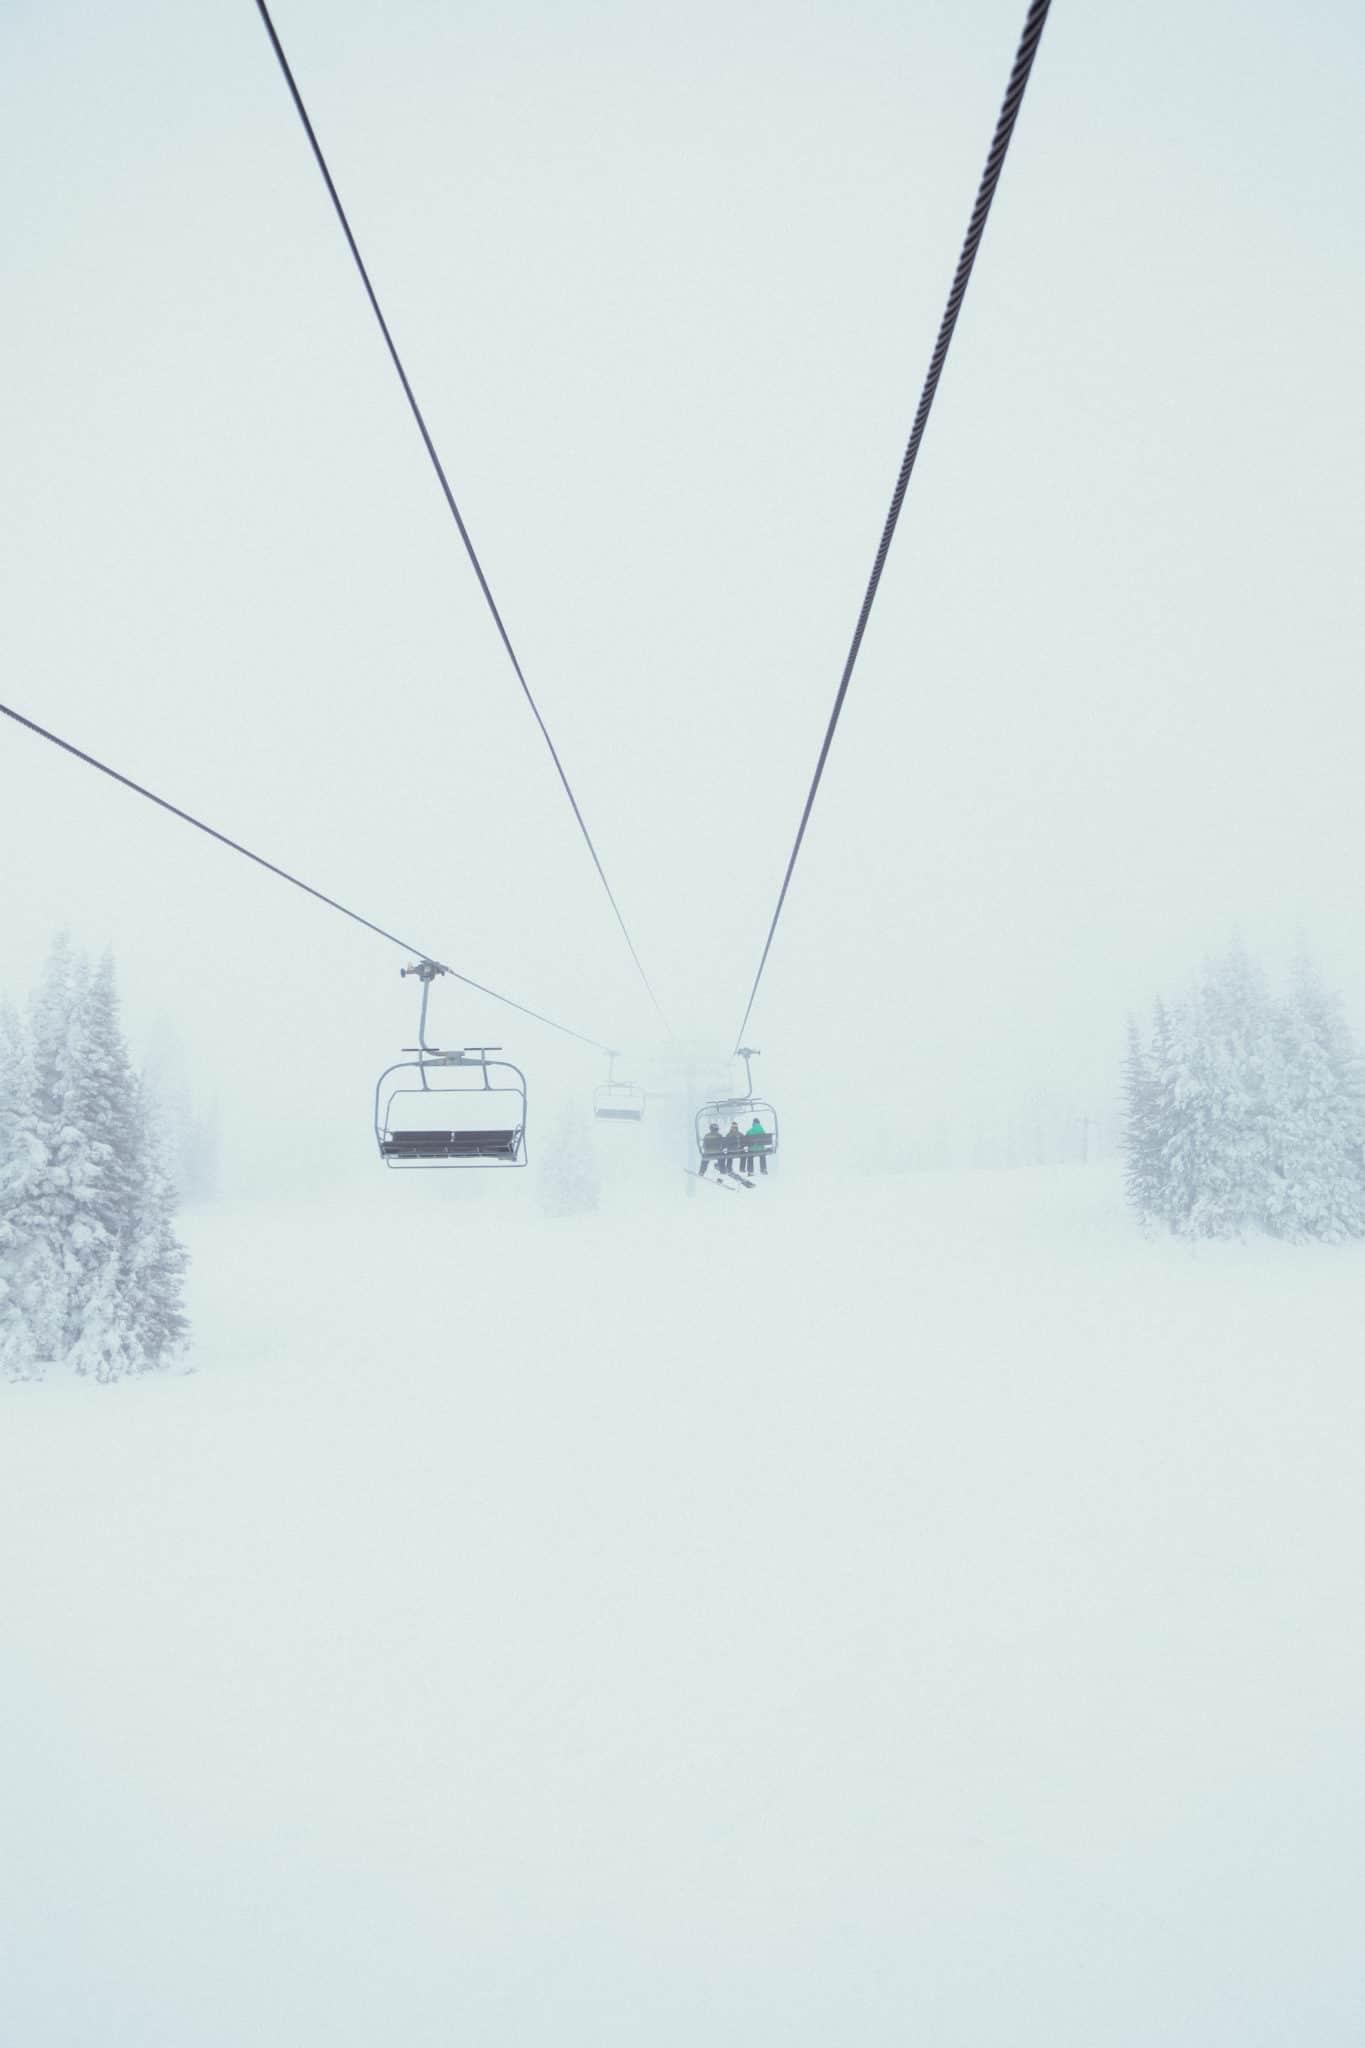 Brundage Mountain Ski Lift - The Mandagies Visit McCall Post